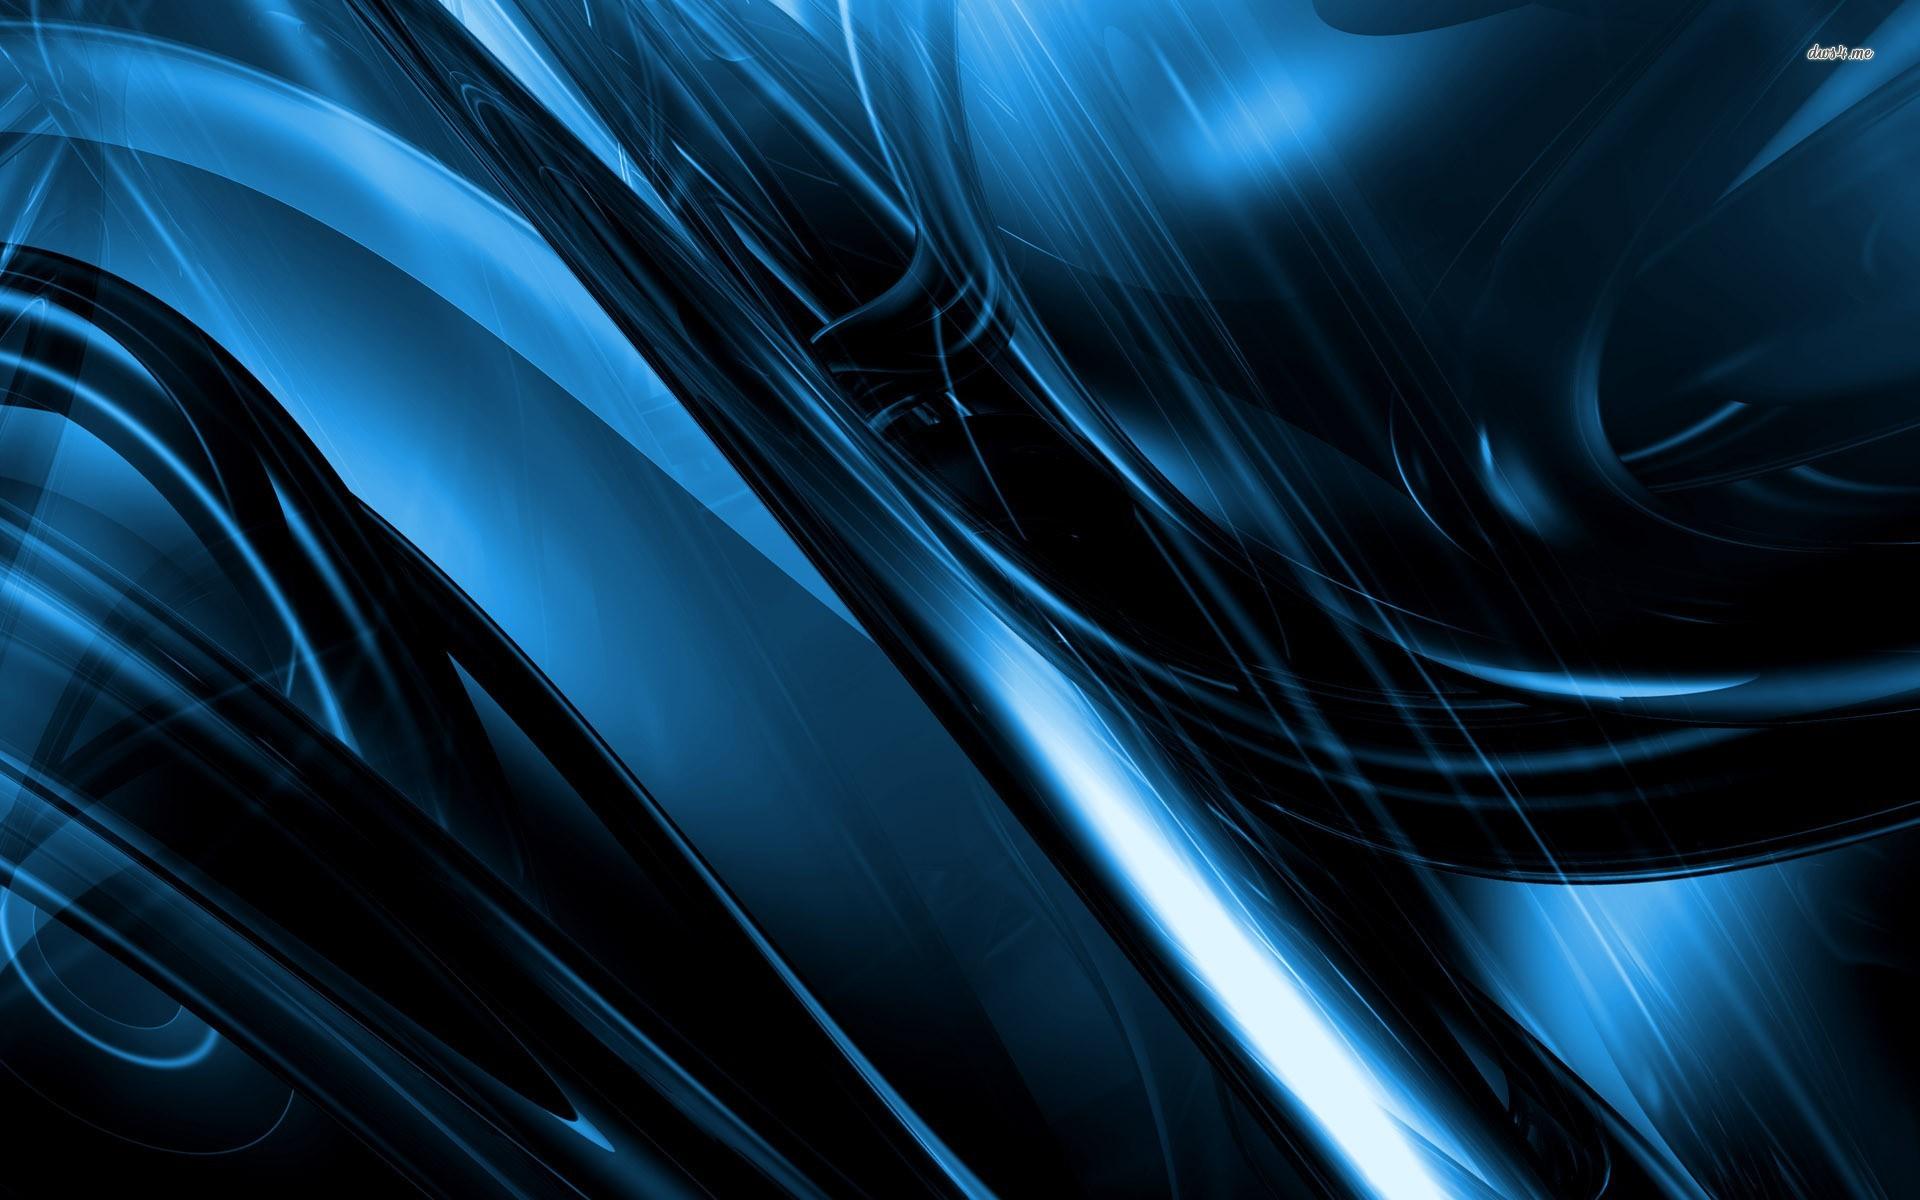 Metallic Blue Wallpaper